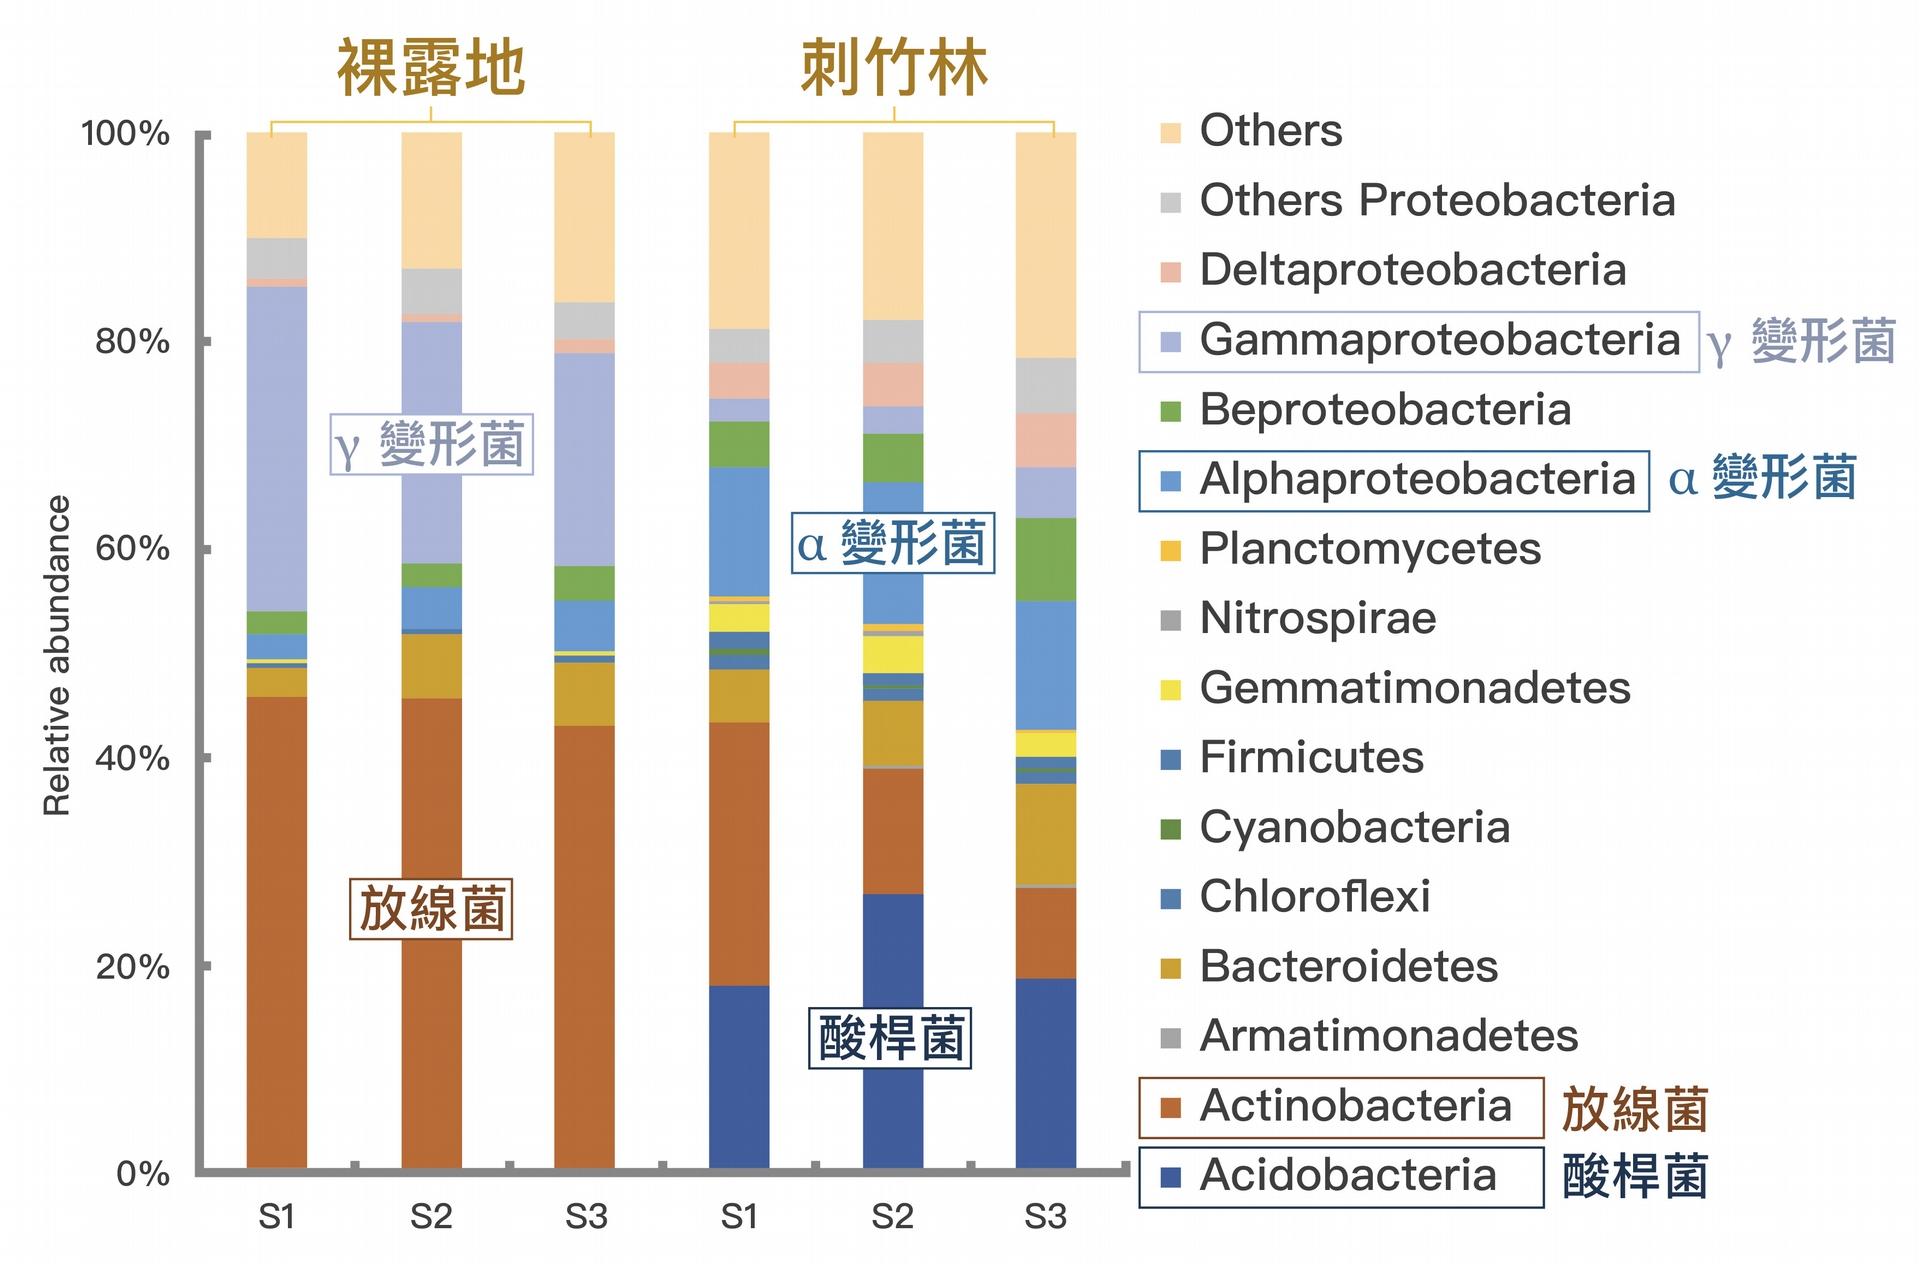 "DNA 定序分析:月世界惡地的「裸露地」和「刺竹林」土壤間細菌族群的差異。資料來源│Lin, Y.T. Whtman, W.B., Coleman, D.C., Shiau, Y.J., Jien, S.H. and Chiu, C.Y.*, 2018, ""The influences of thorny bamboo growth on the bacterial community in badland soils of southwestern Taiwan"", Land Degradation & Development, 29(8), 2728-2738. 圖說重製│廖英凱、張語辰"